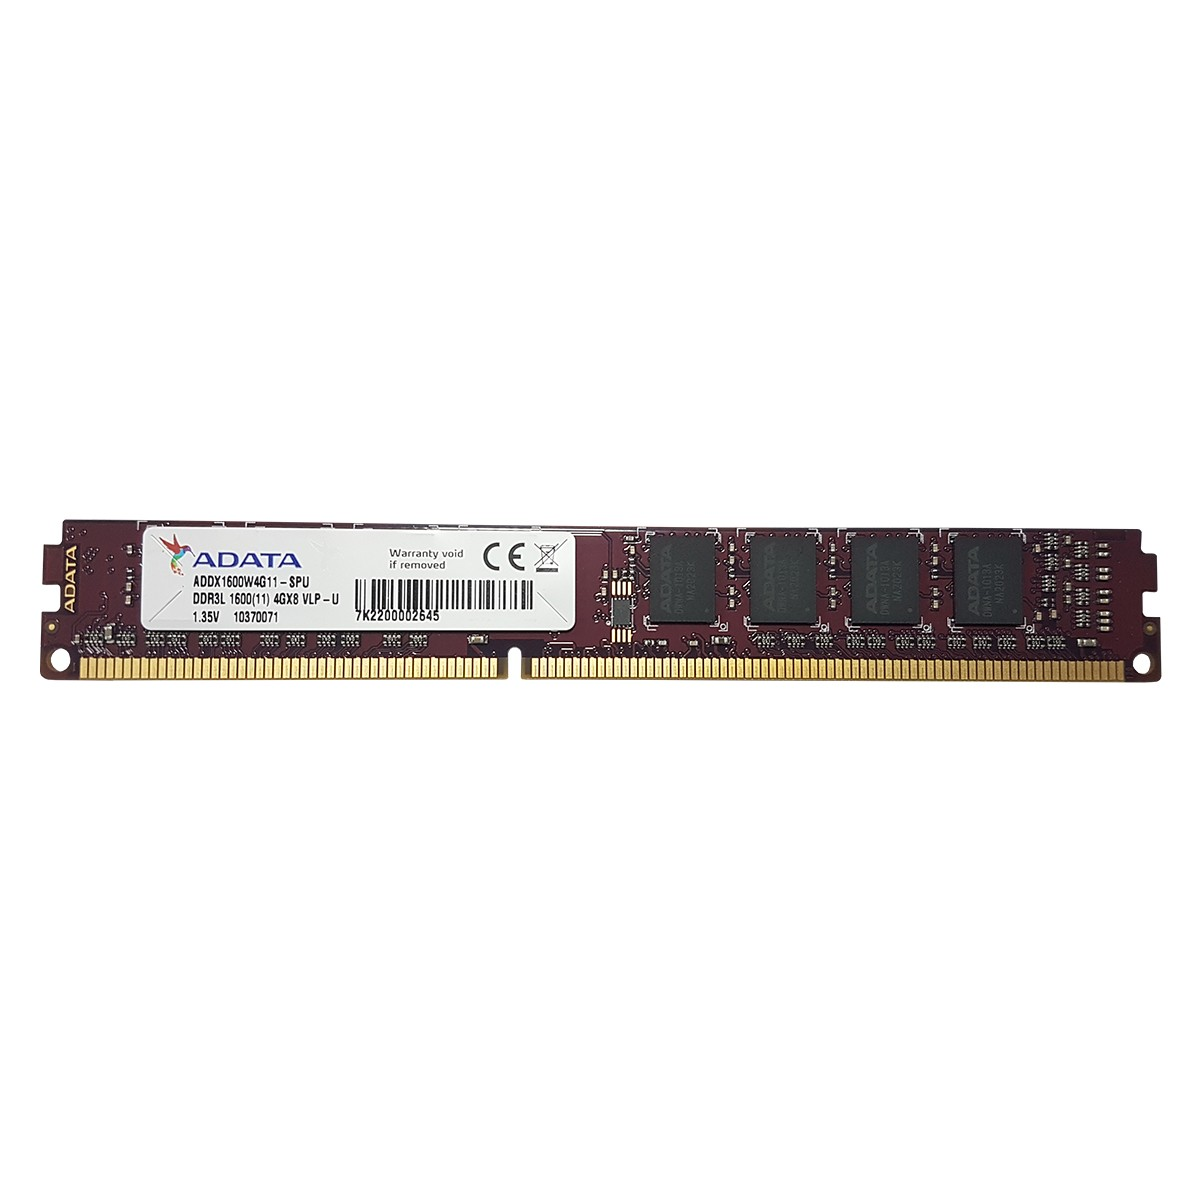 Memoria RAM Adata para PC, 4GB, DDR3L, 1600MHZ - ADDX1600W4G11-SPU